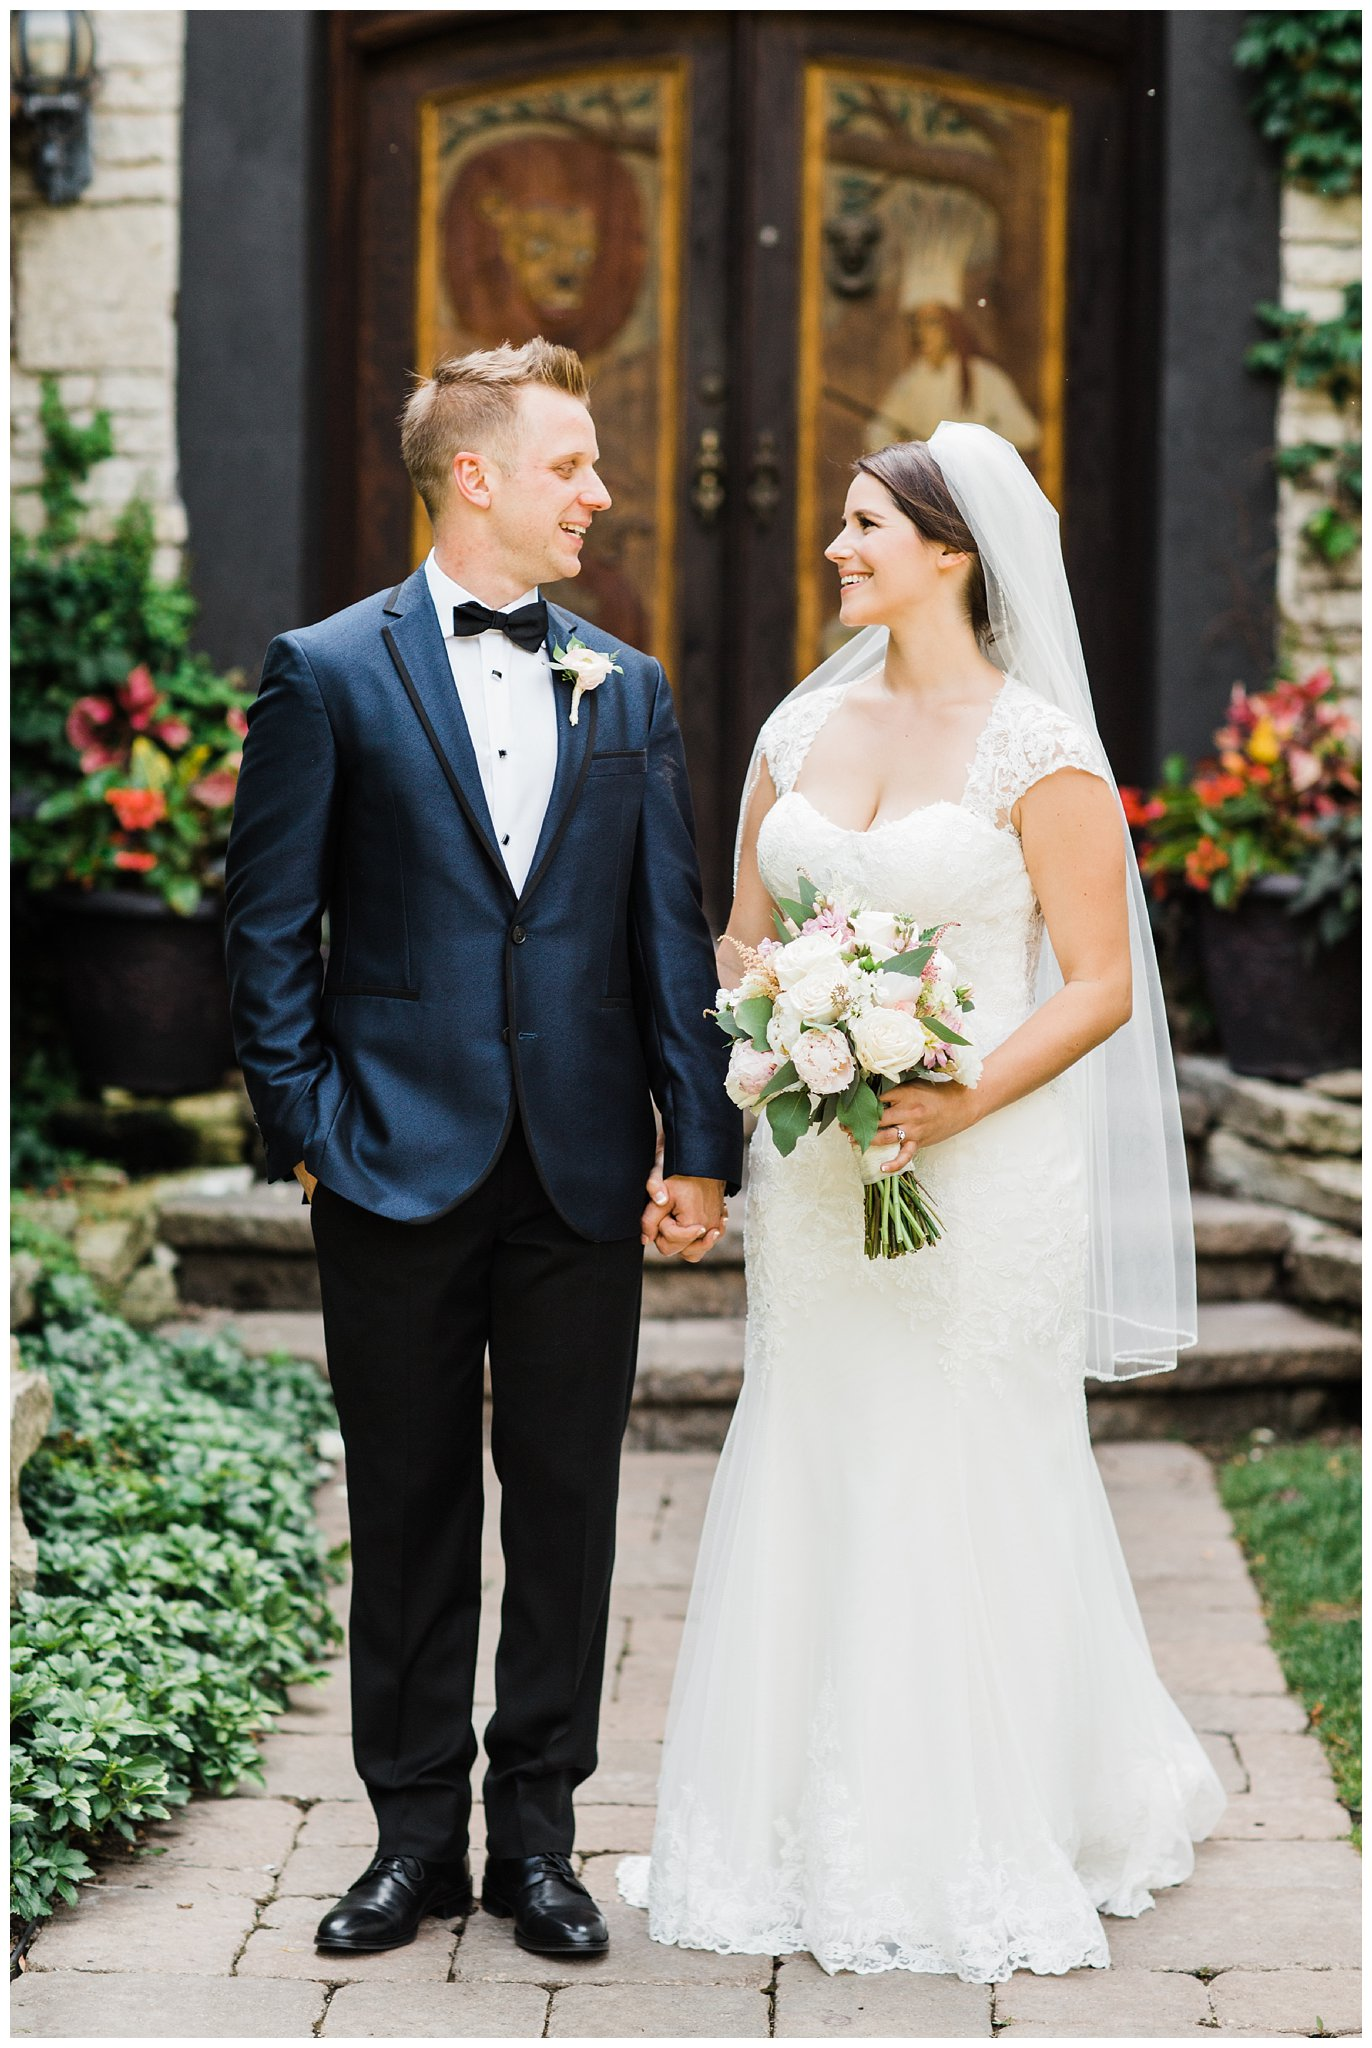 Alicia&Kurt_RavisloeCountryClubWedding_Chicagoweddingphotographer_RebeccaHaleyPhotography_0161.jpg